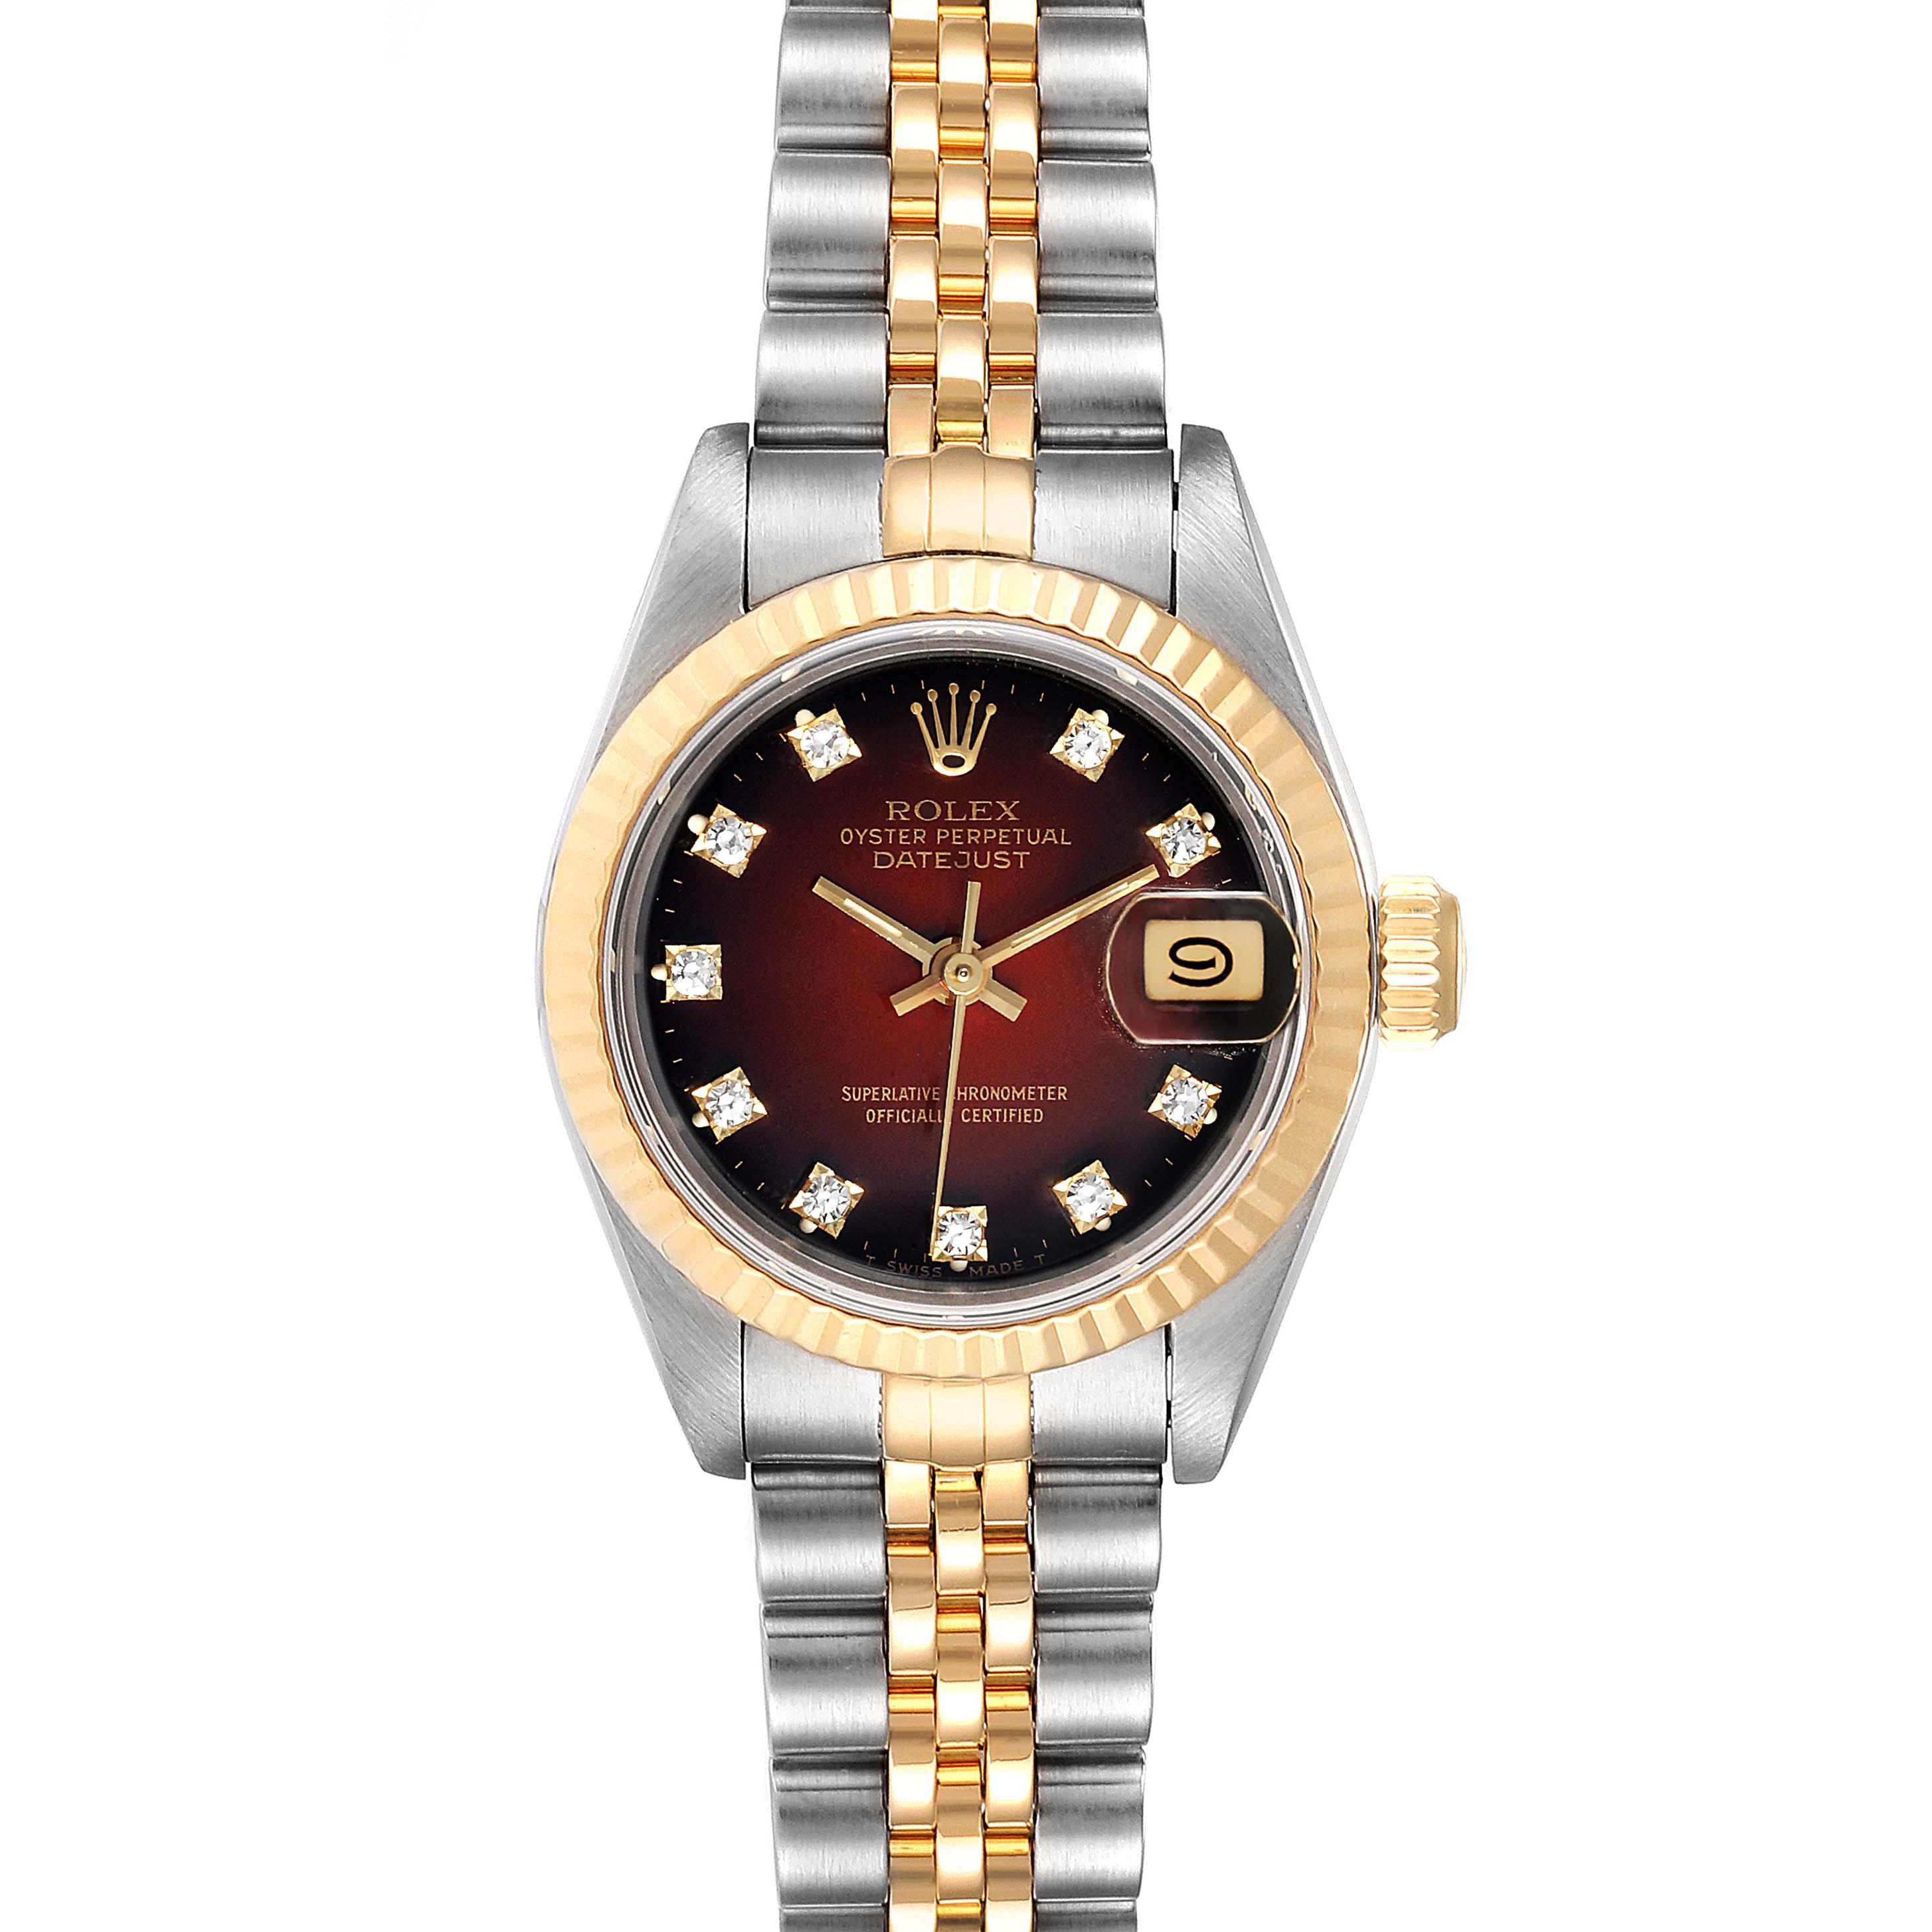 Rolex Datejust Steel Yellow Gold Vignette Diamond Dial Ladies Watch 69173